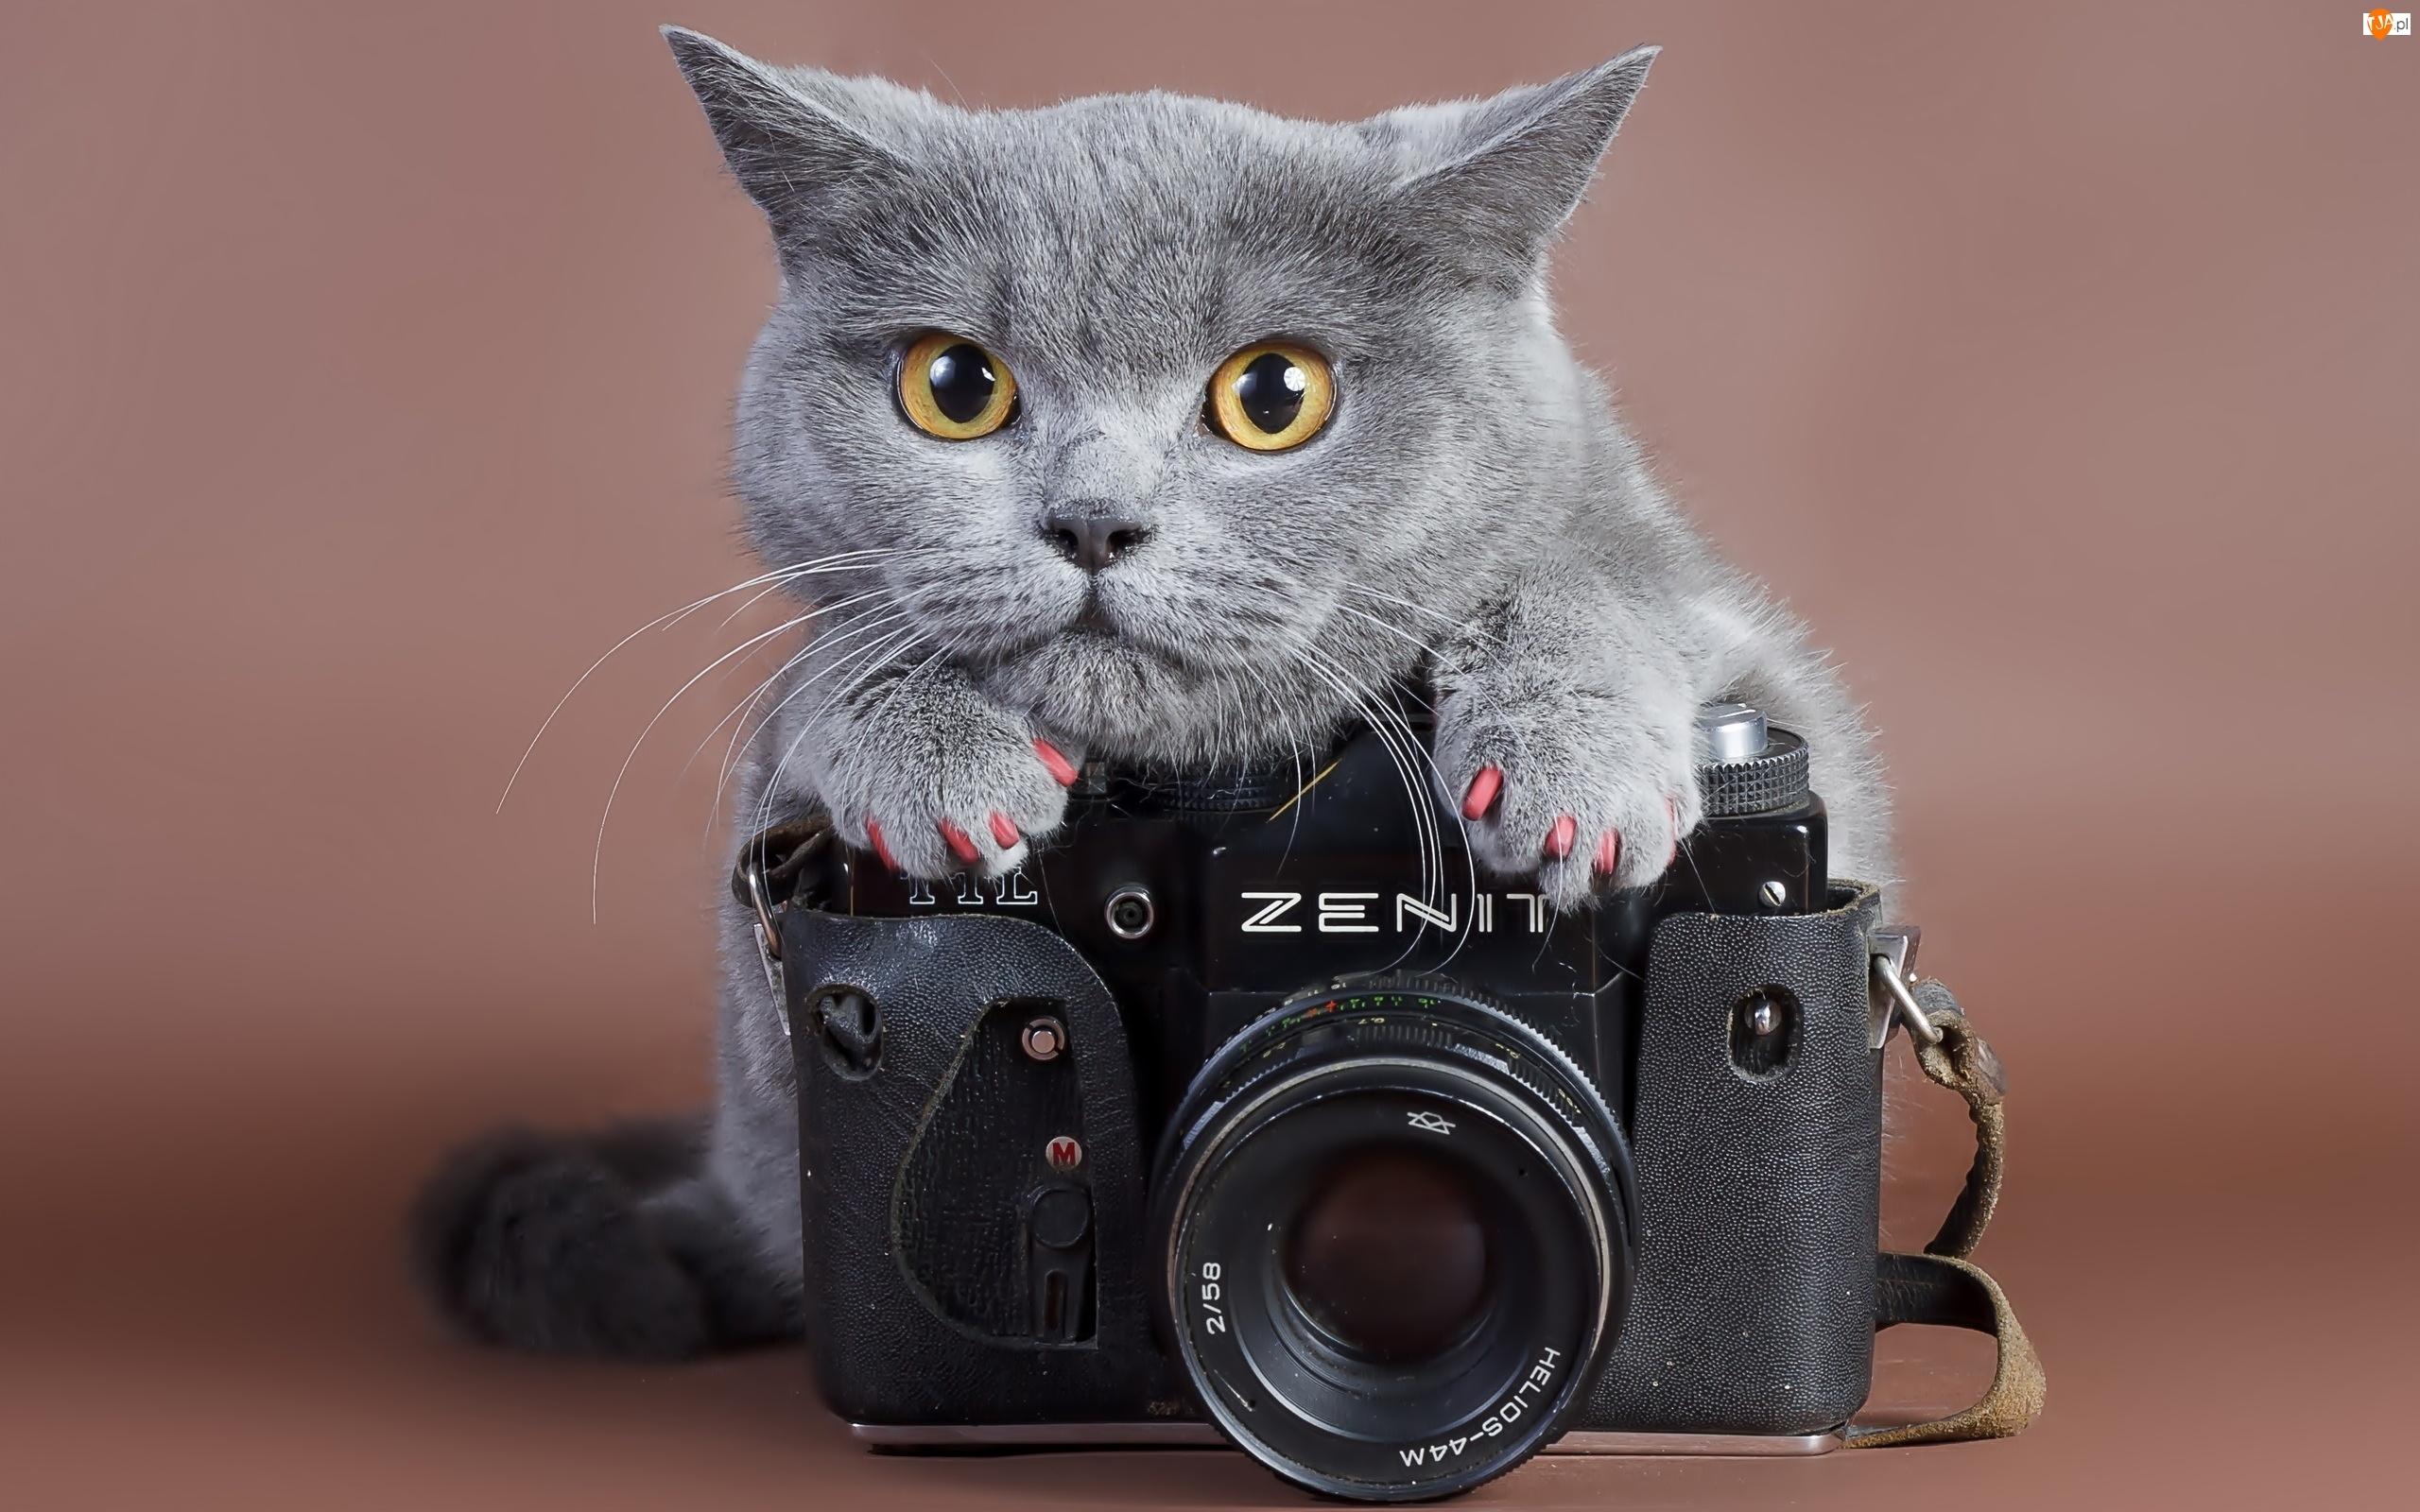 Kot, Zenit, Aparat, Fotograficzny